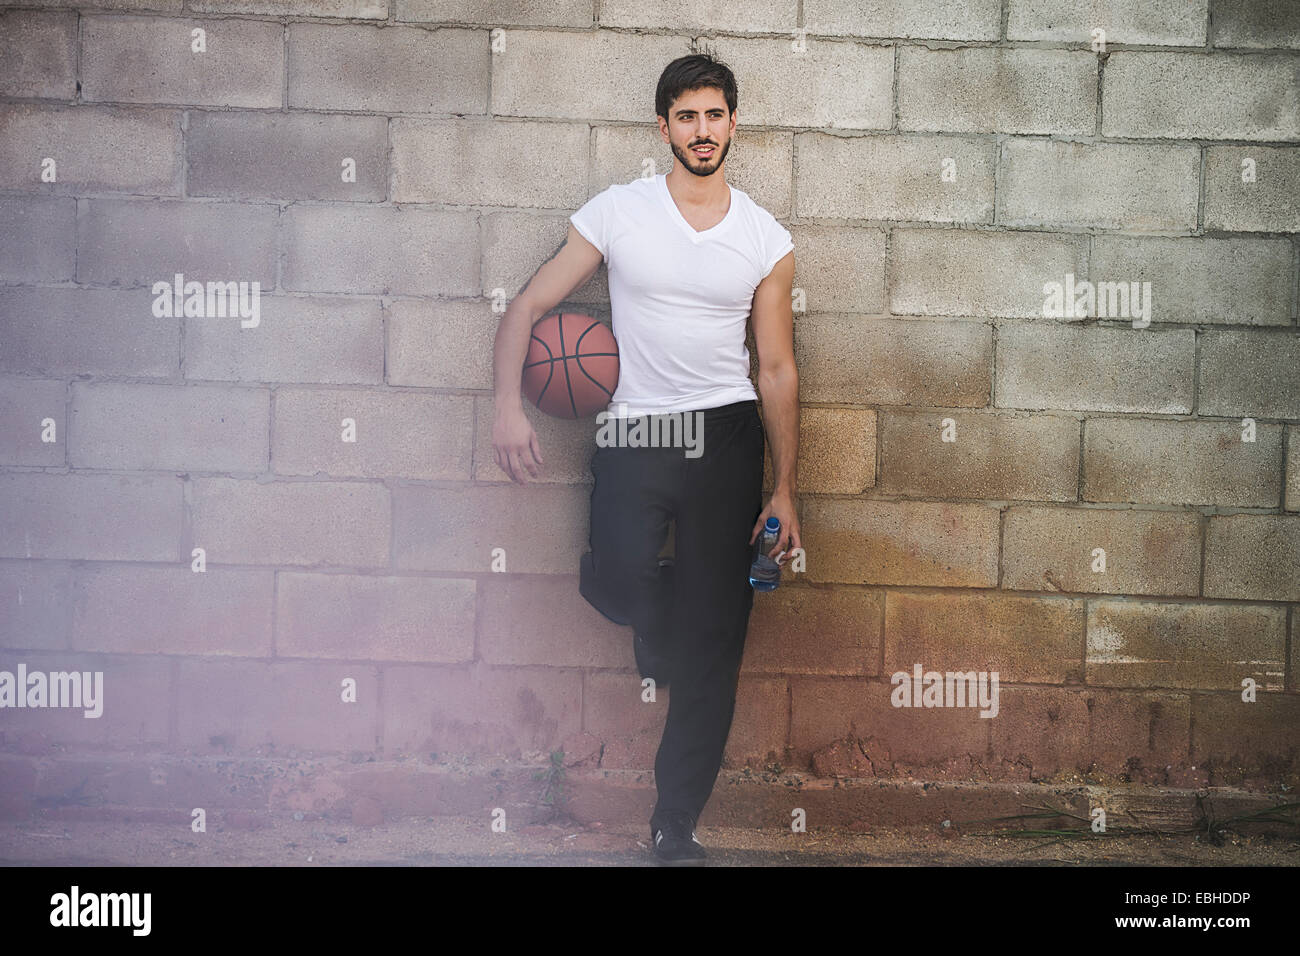 Jeune joueur de basket-ball masculin leaning against wall Photo Stock